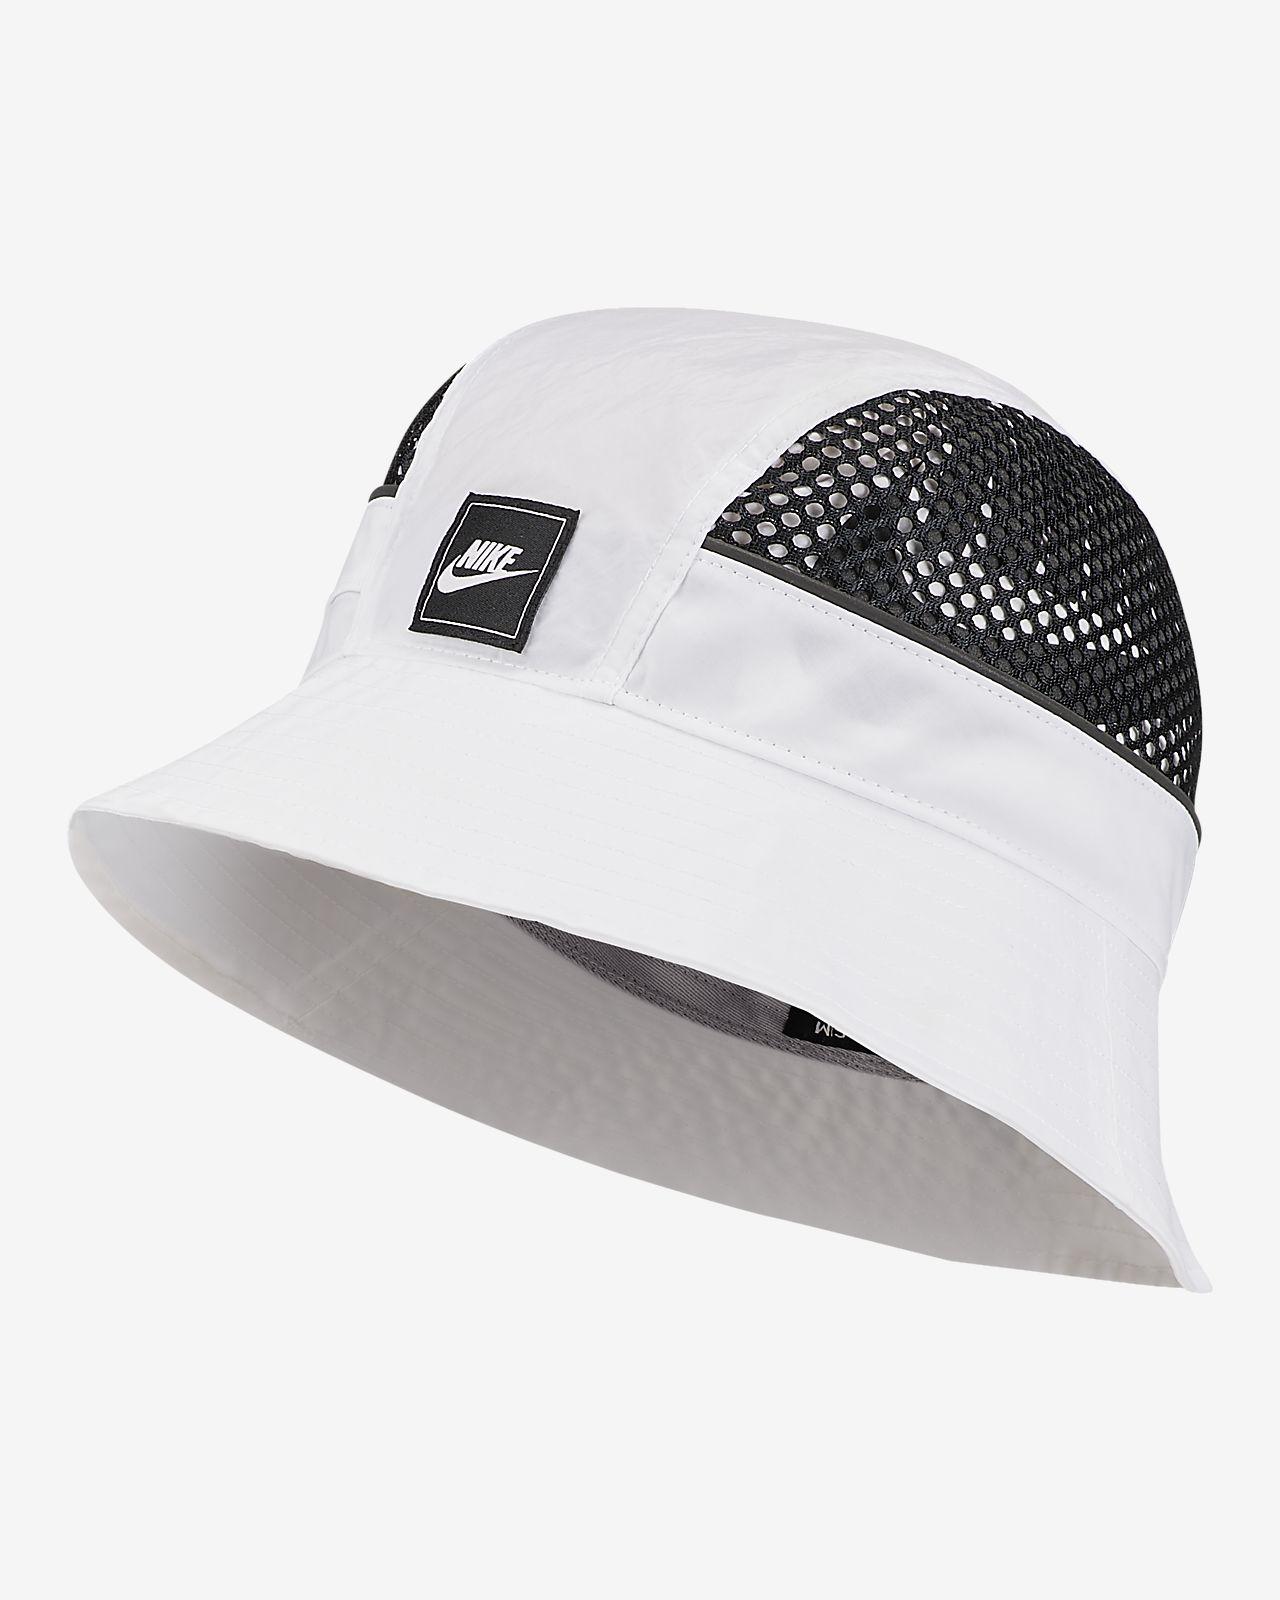 Nike Sportswear Mesh Gorra de pescador